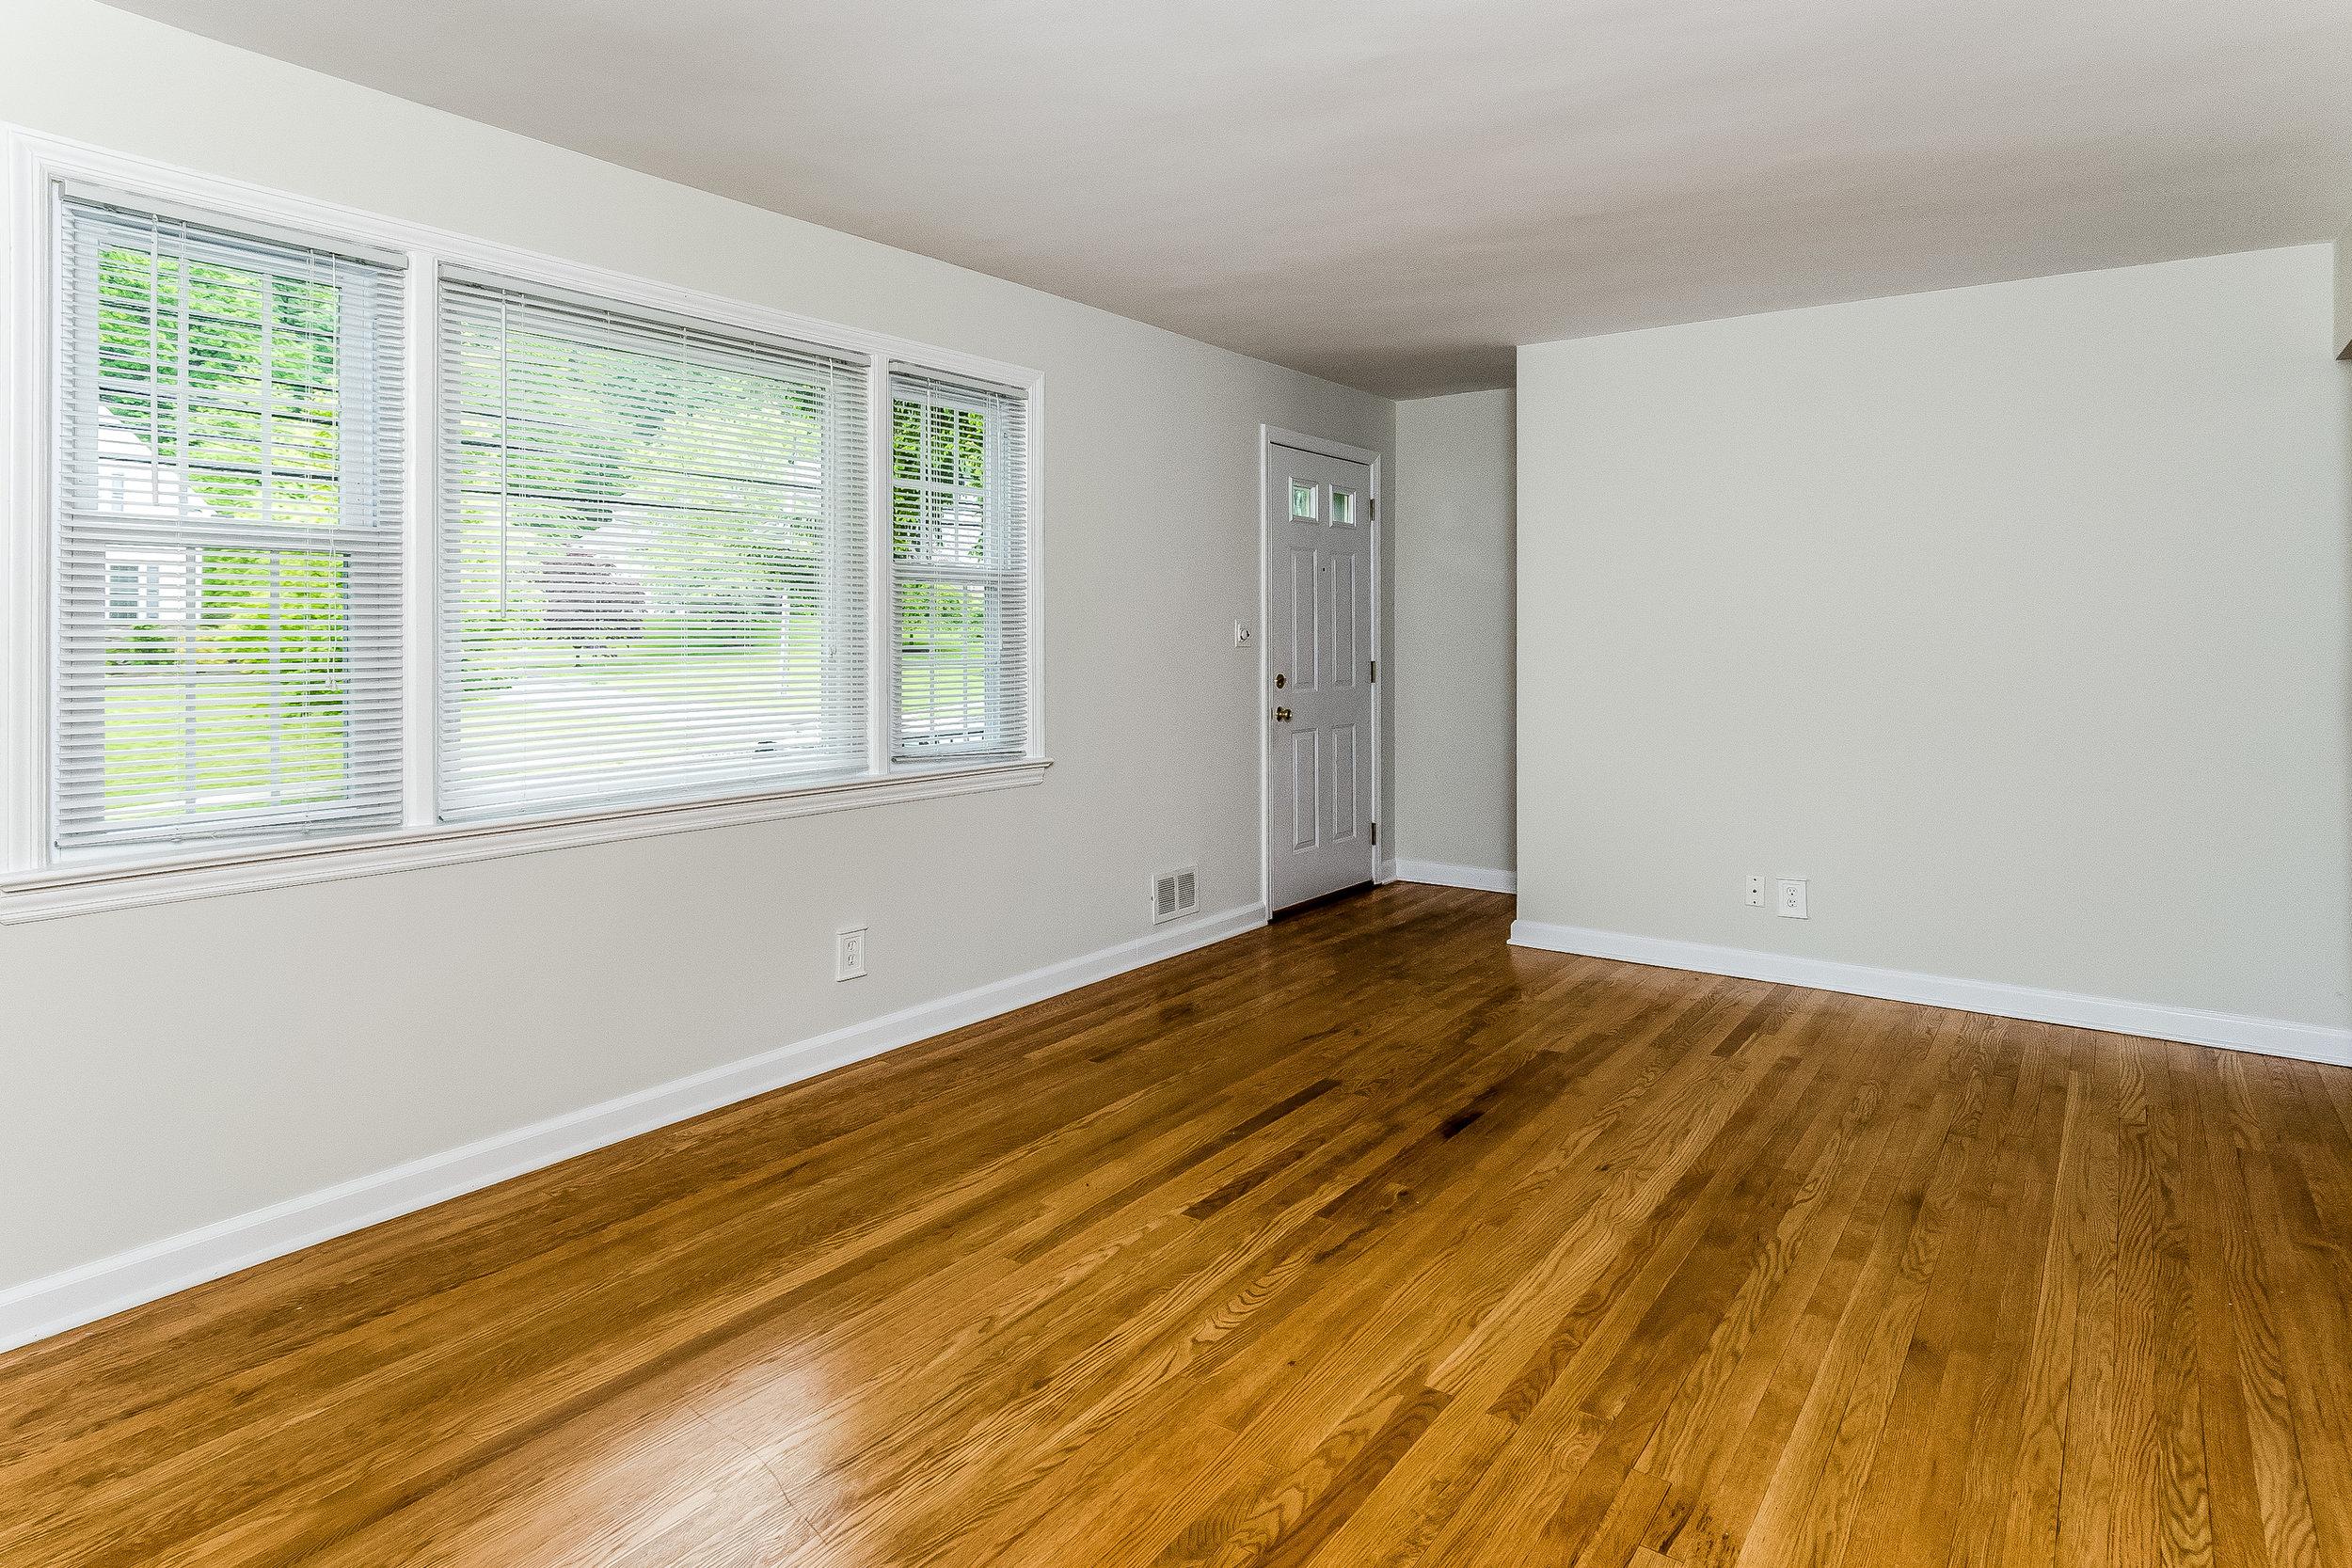 008-photo-living-room-5786551.jpg